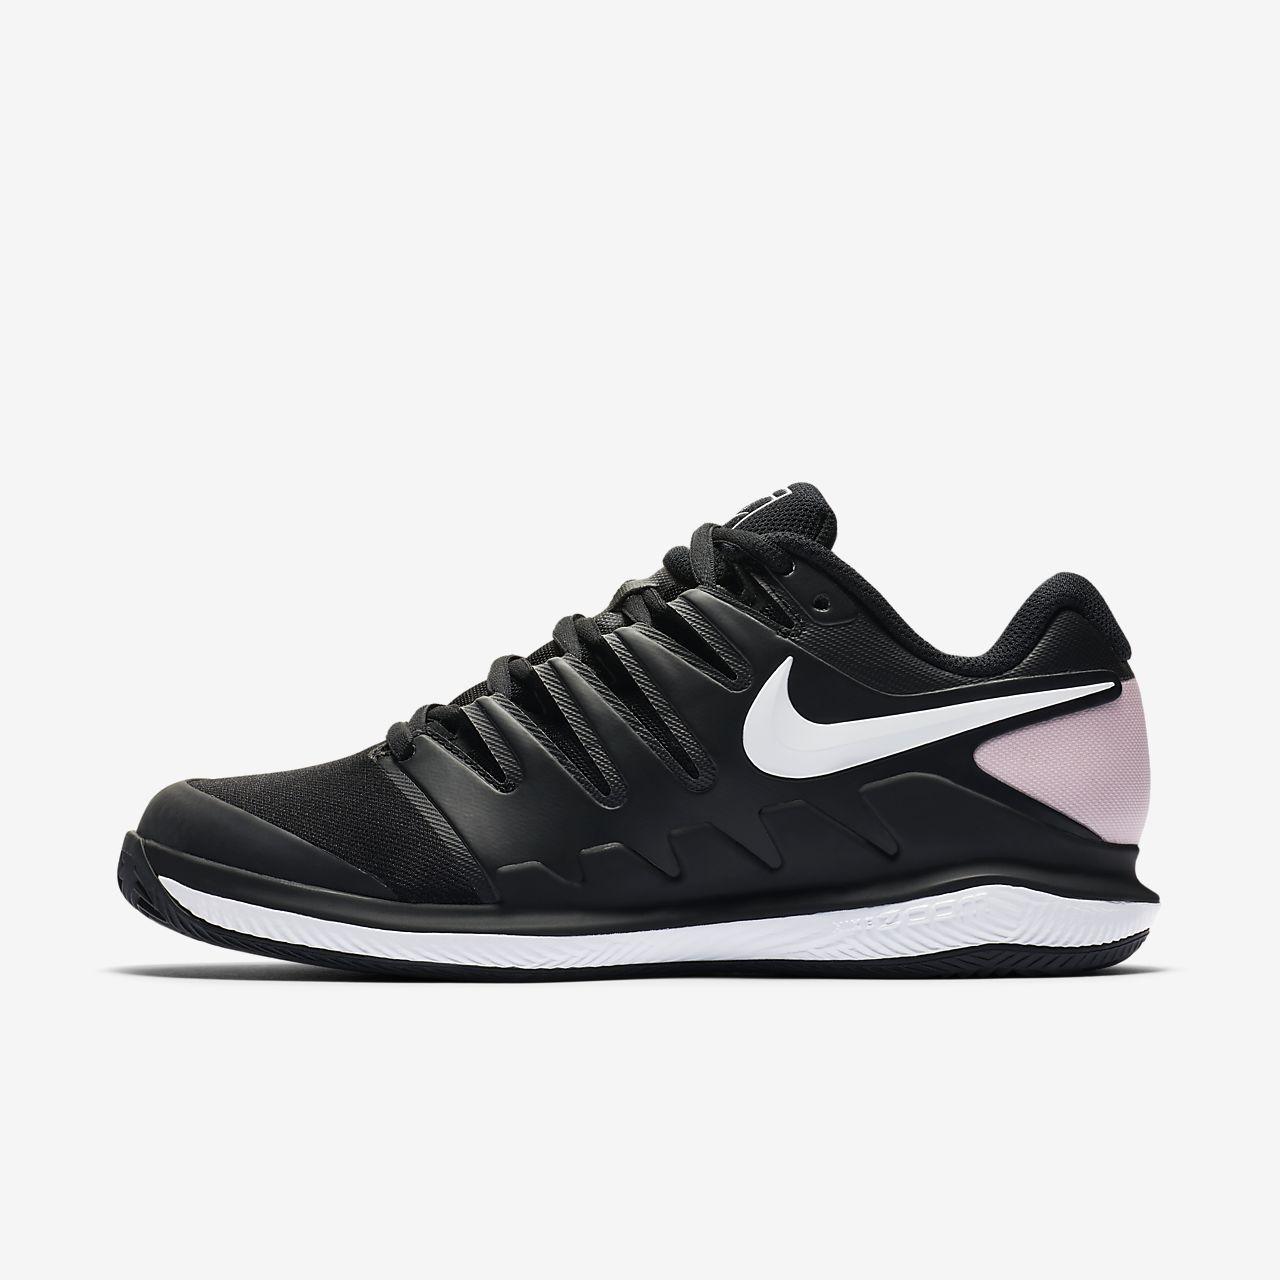 Damen Tennisschuhe Nike Air Zoom Vapor X Clay | Tennislife